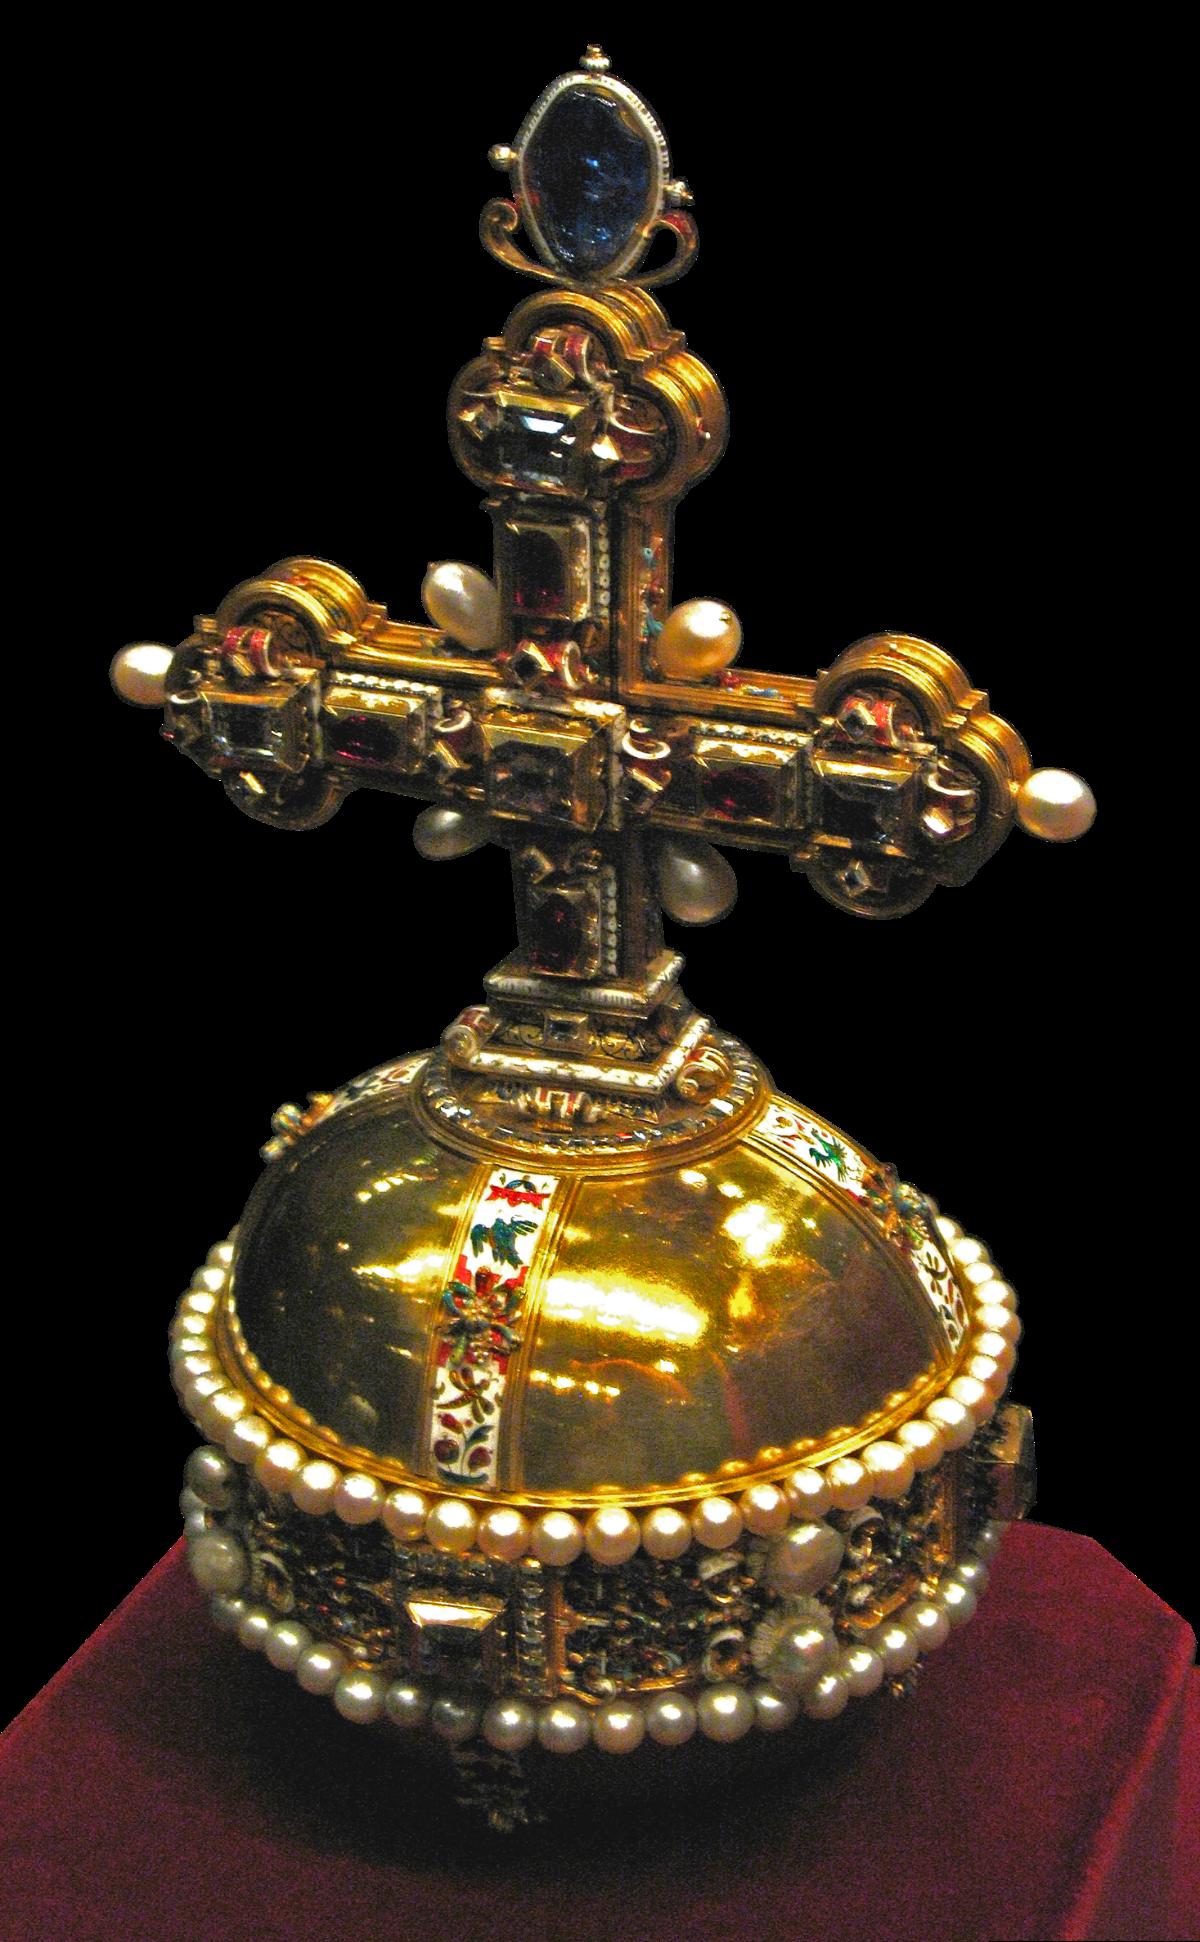 globus cruciger - Wiktionary